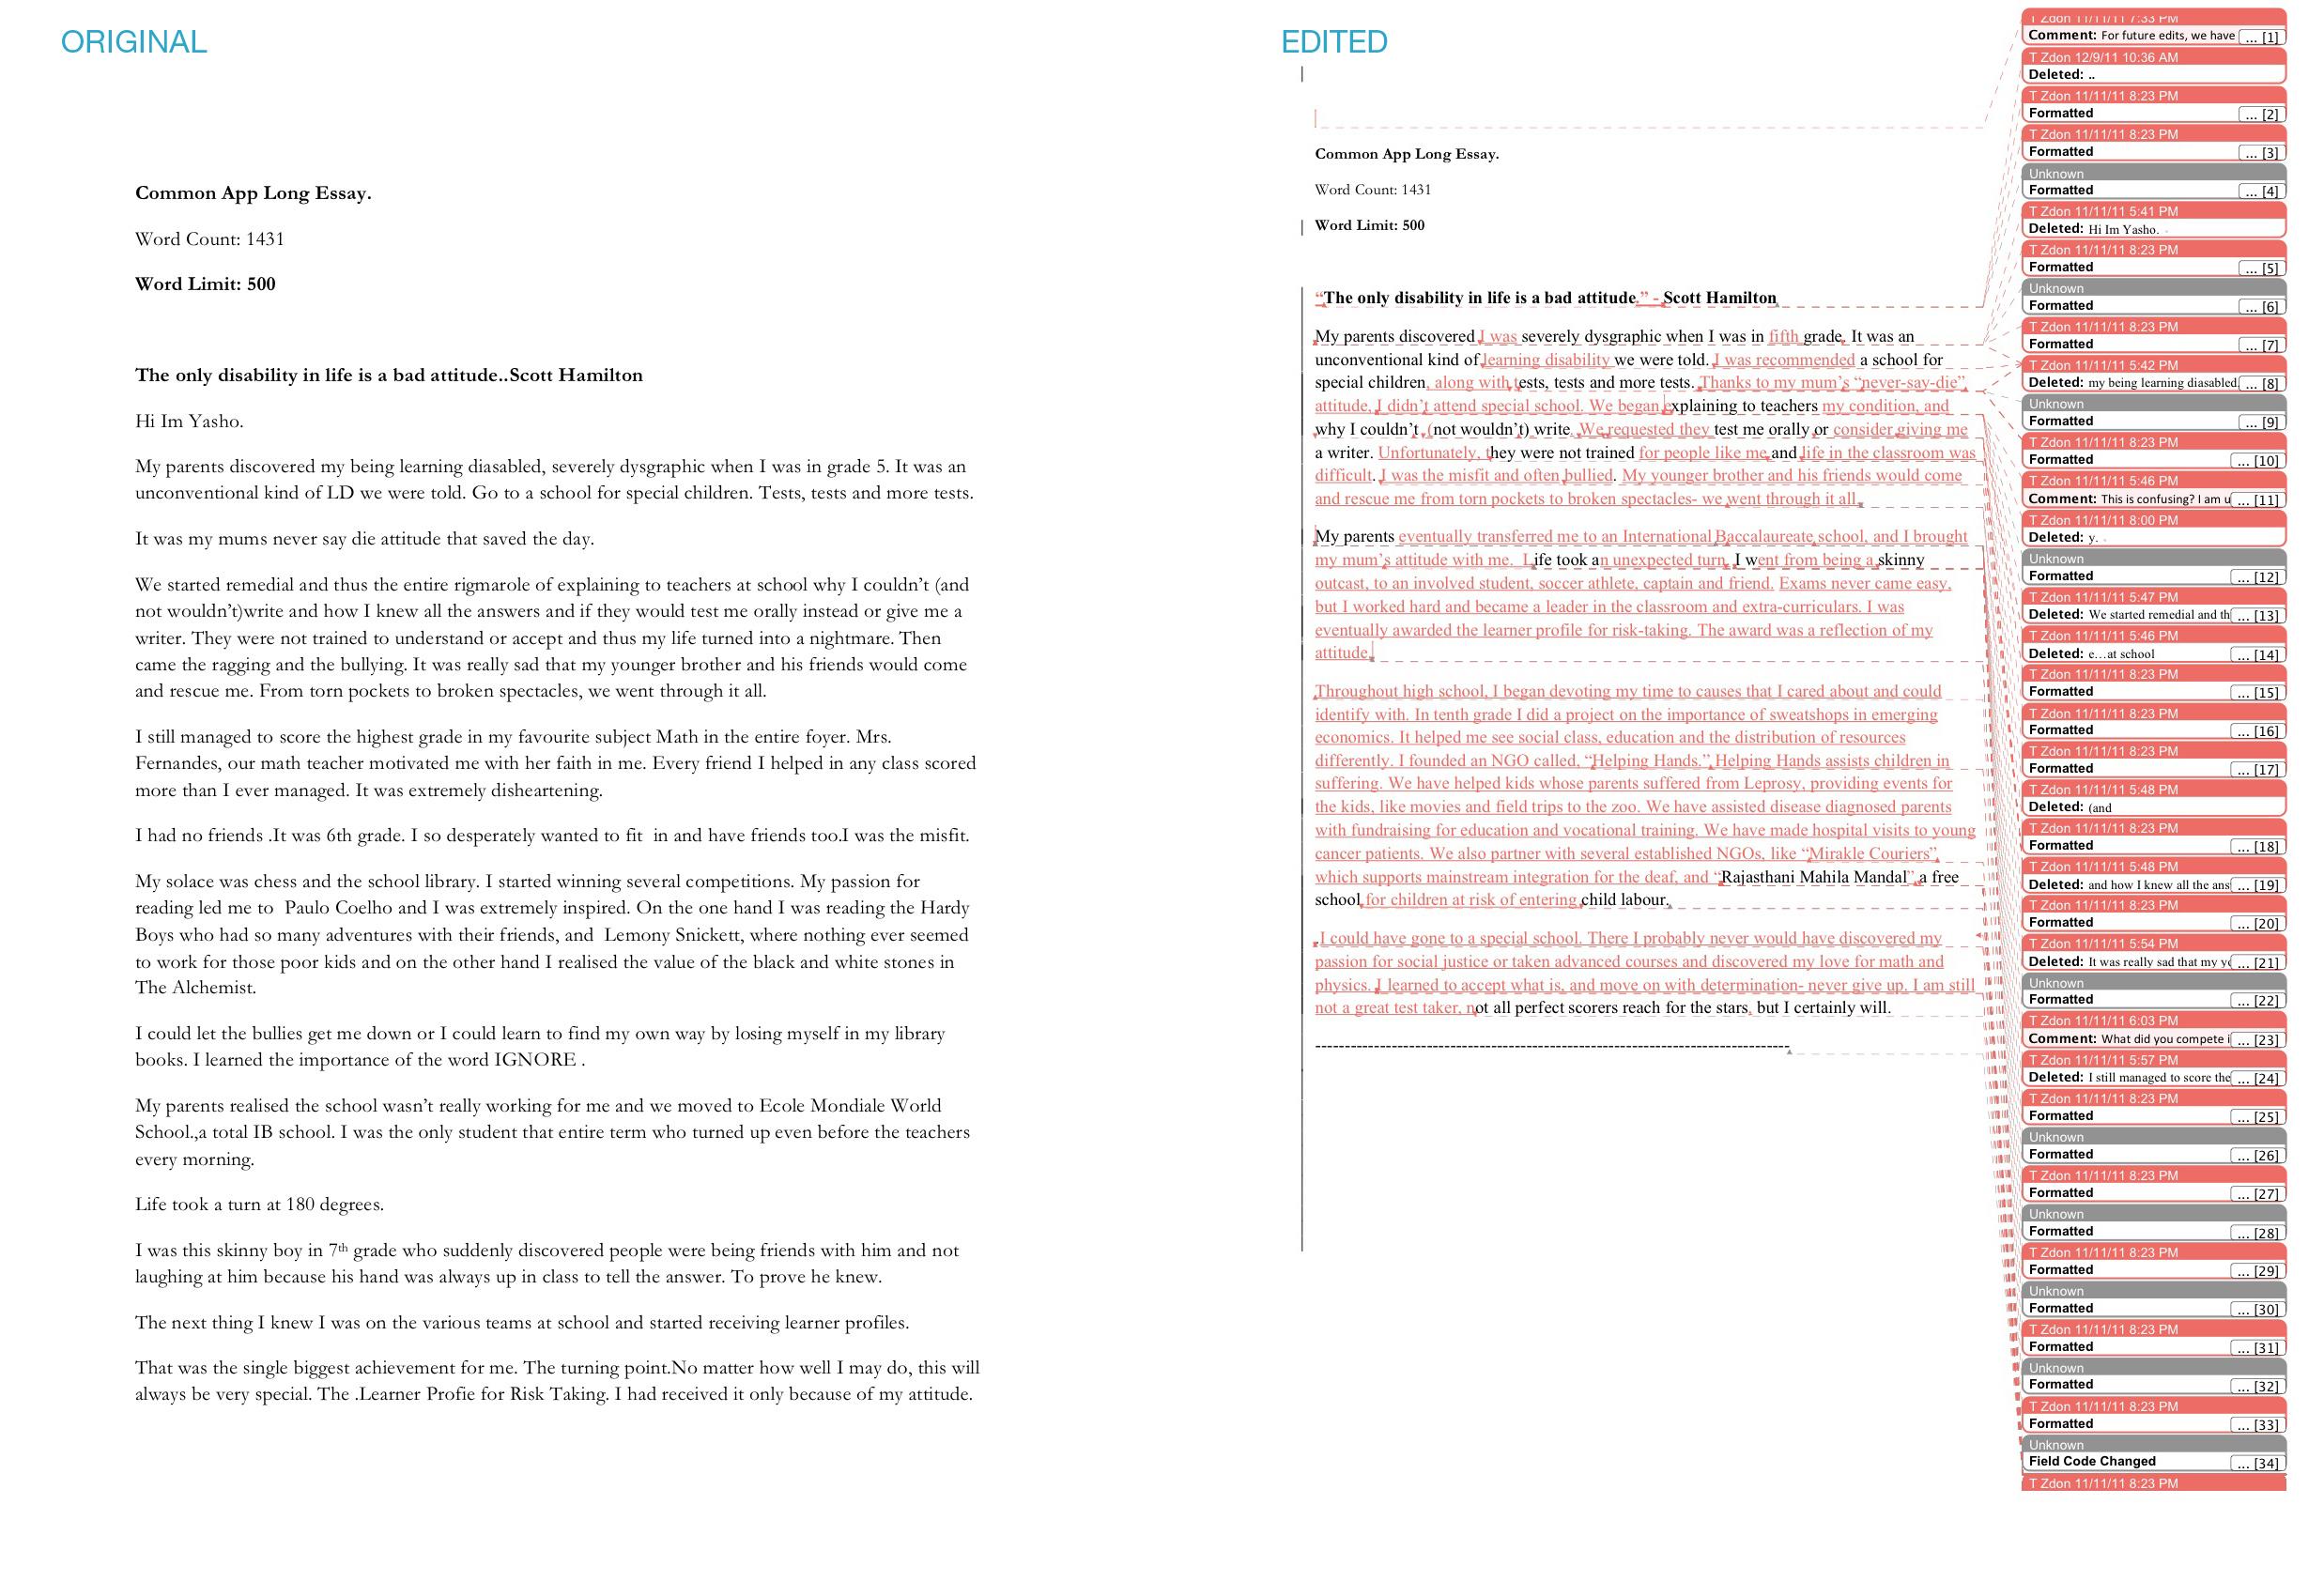 006 Common Application Essays Beautiful Essay Examples App Ideas 2016 Cornell 2017 Full